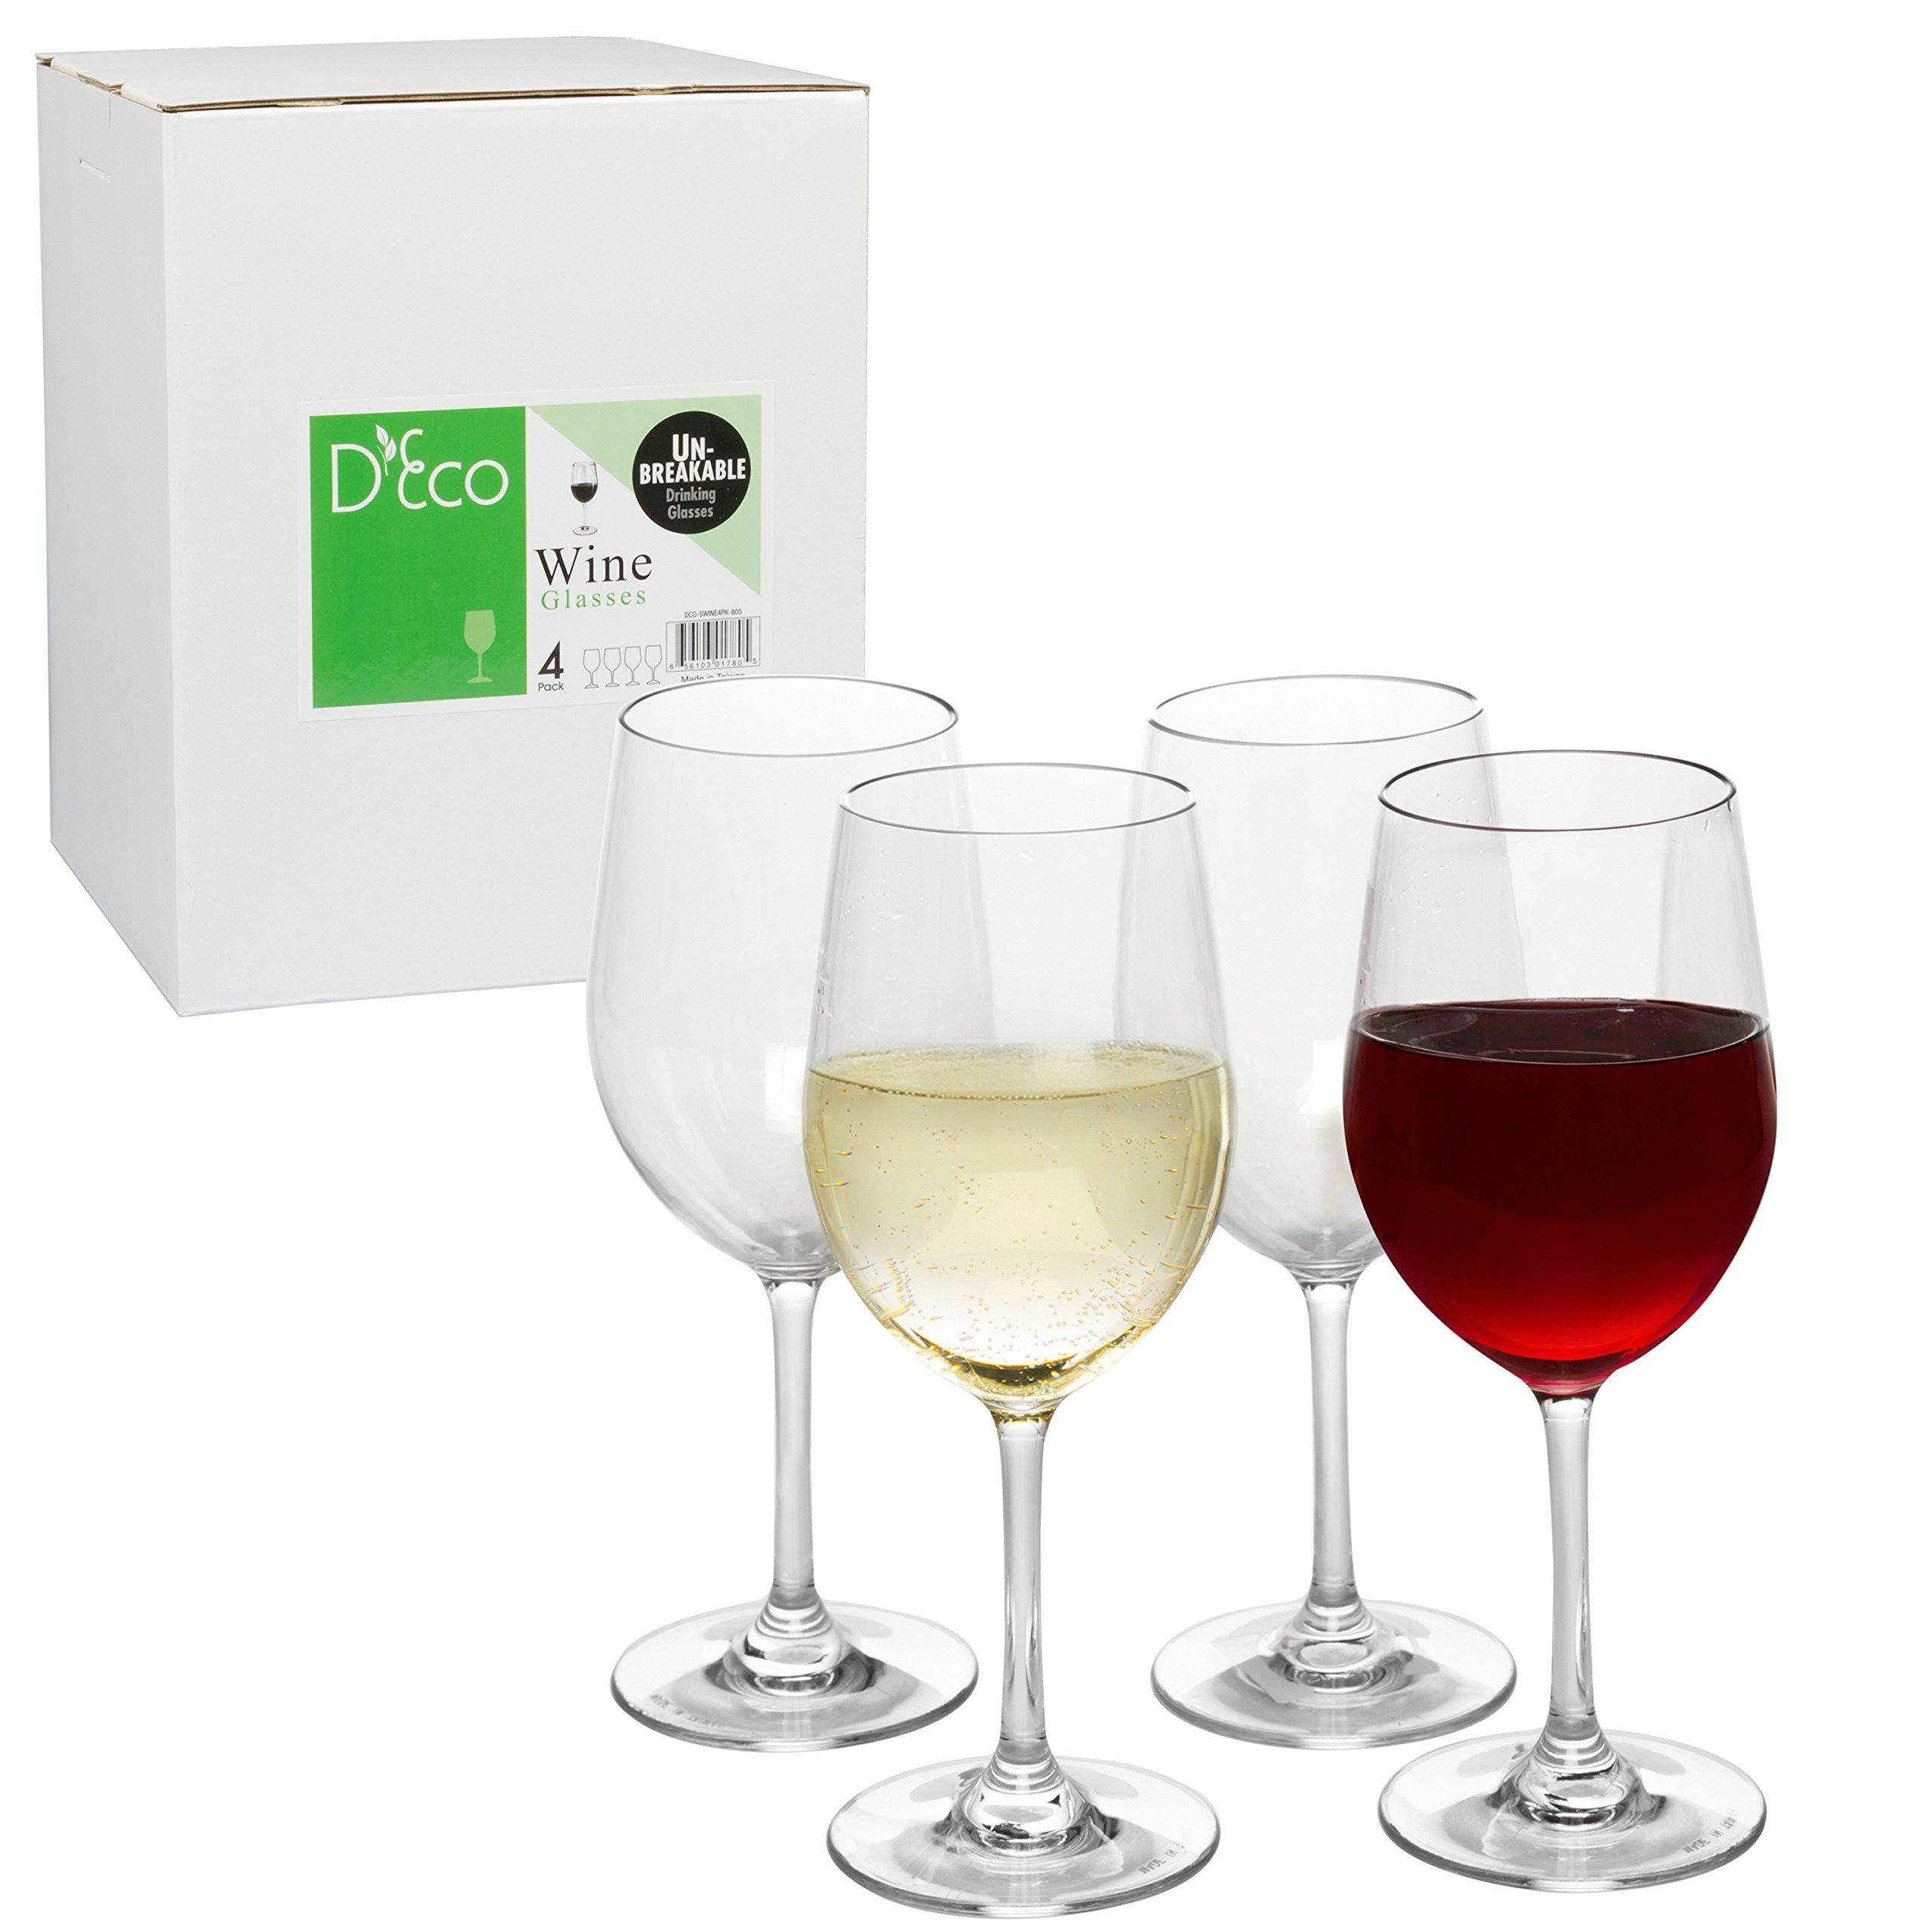 Unbreakable Wine Glasses - 100% Tritan - Shatterproof, Reusable, Dishwasher Safe (Set of 4) by D'Eco